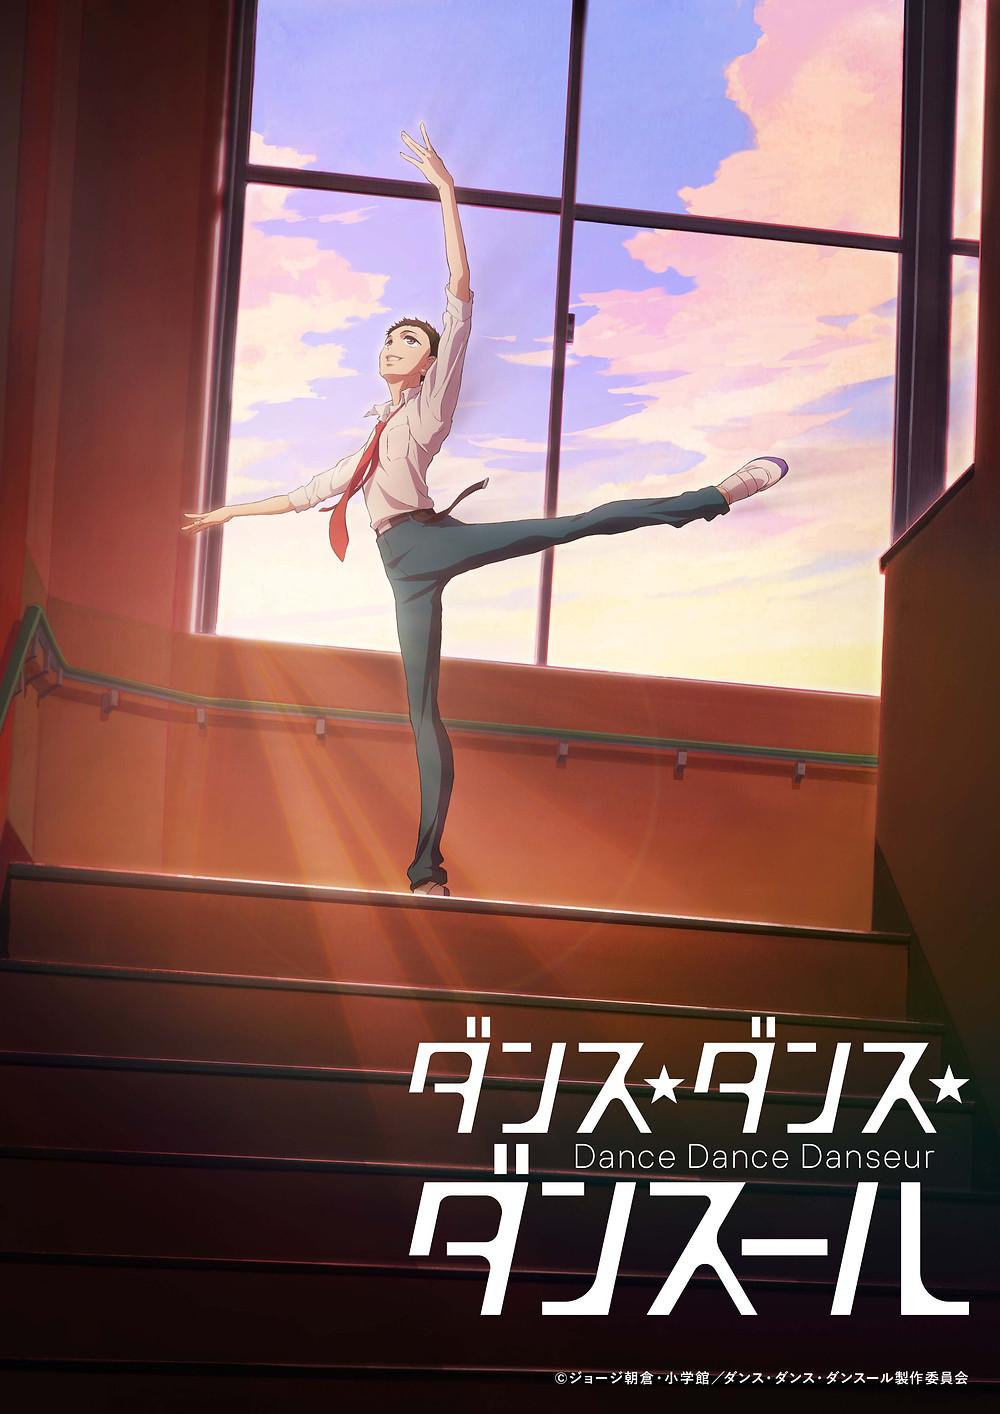 Dance Dance Danseur teaser visual